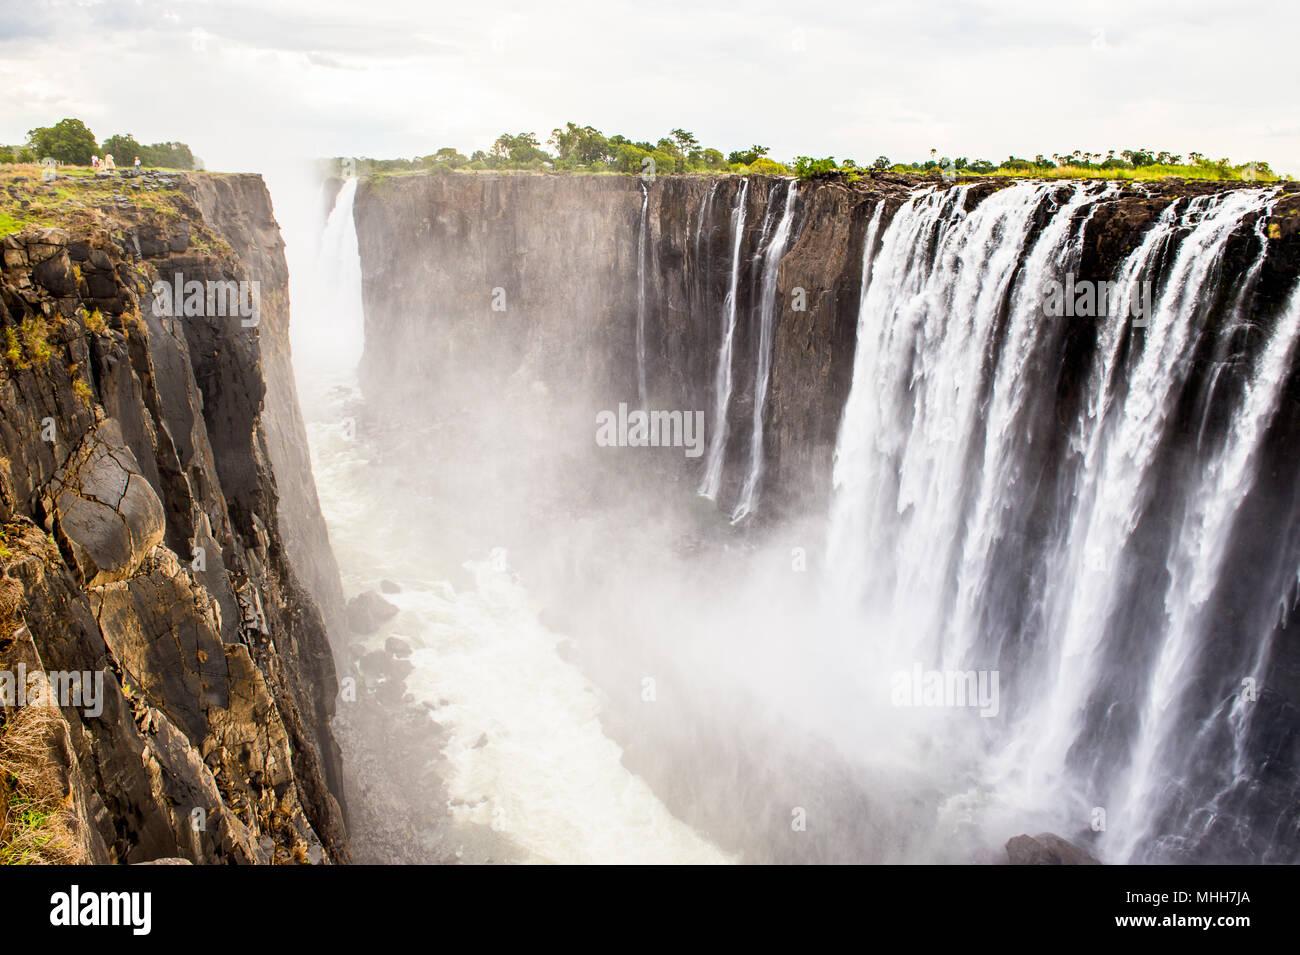 Vista panorámica del río Zambezi, en Victoria Falls, Zimbabwe y Zambia Imagen De Stock